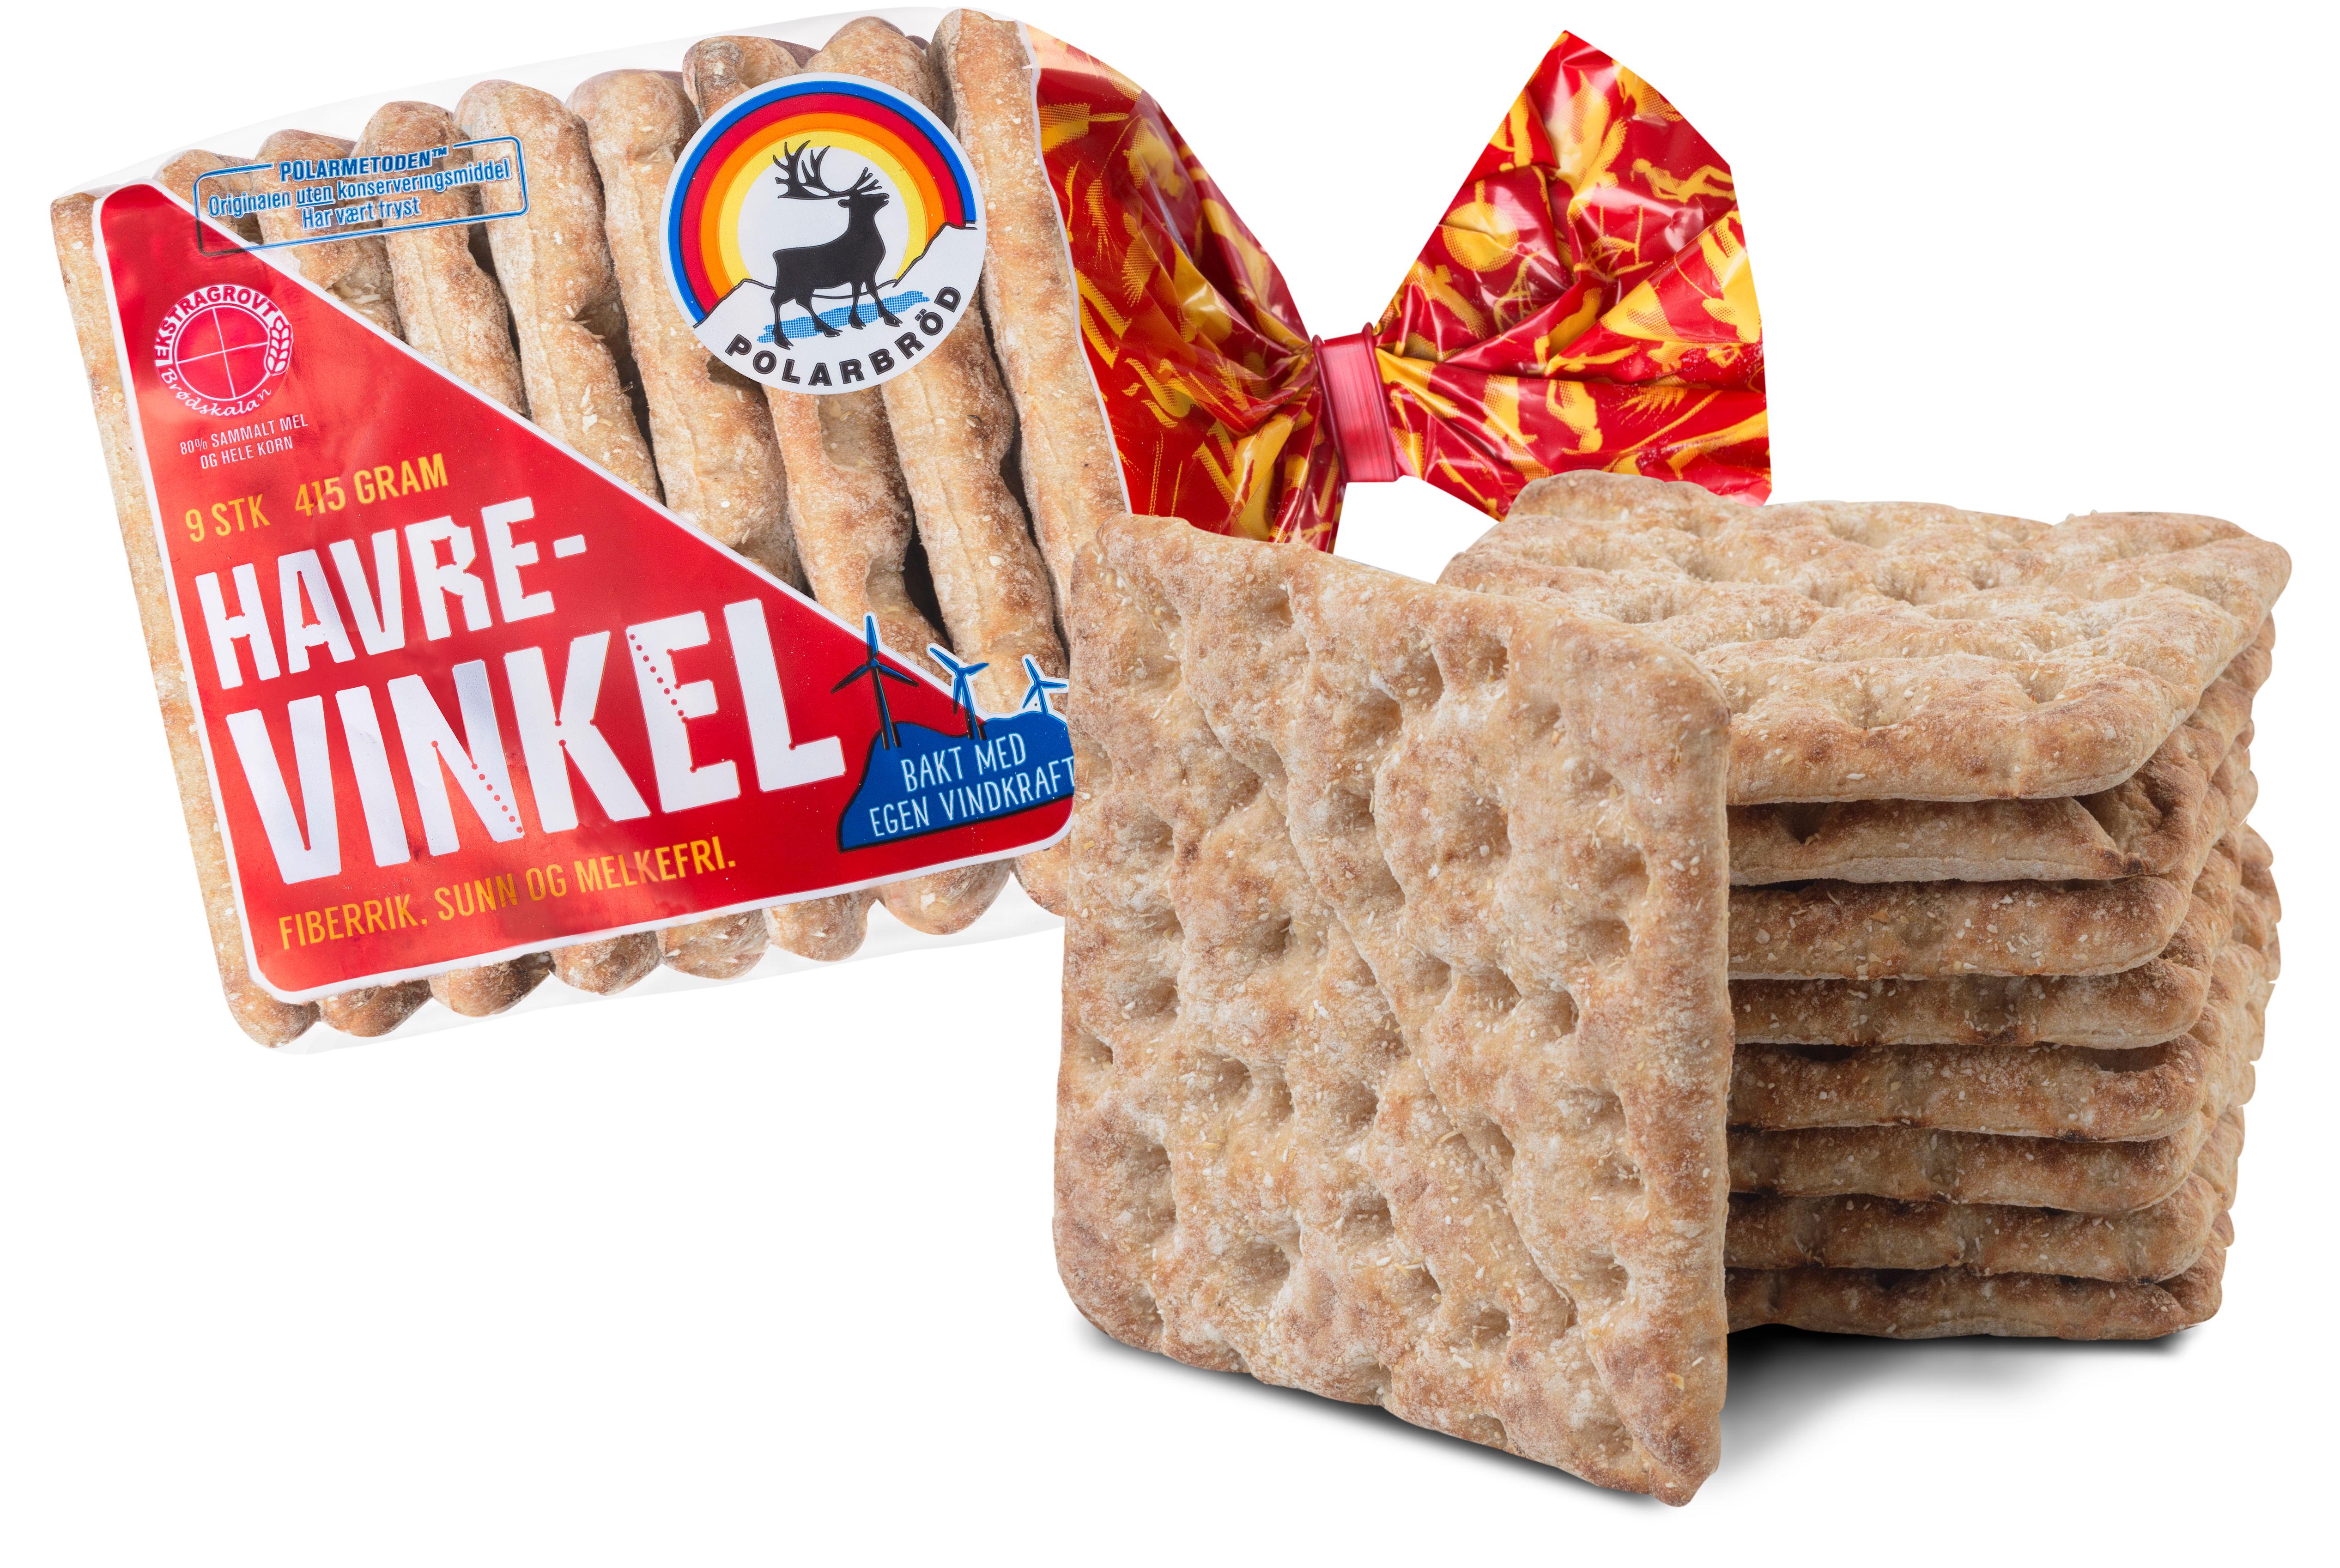 Havrevinkel fra Polarbrød passer perfekt i matpakken.